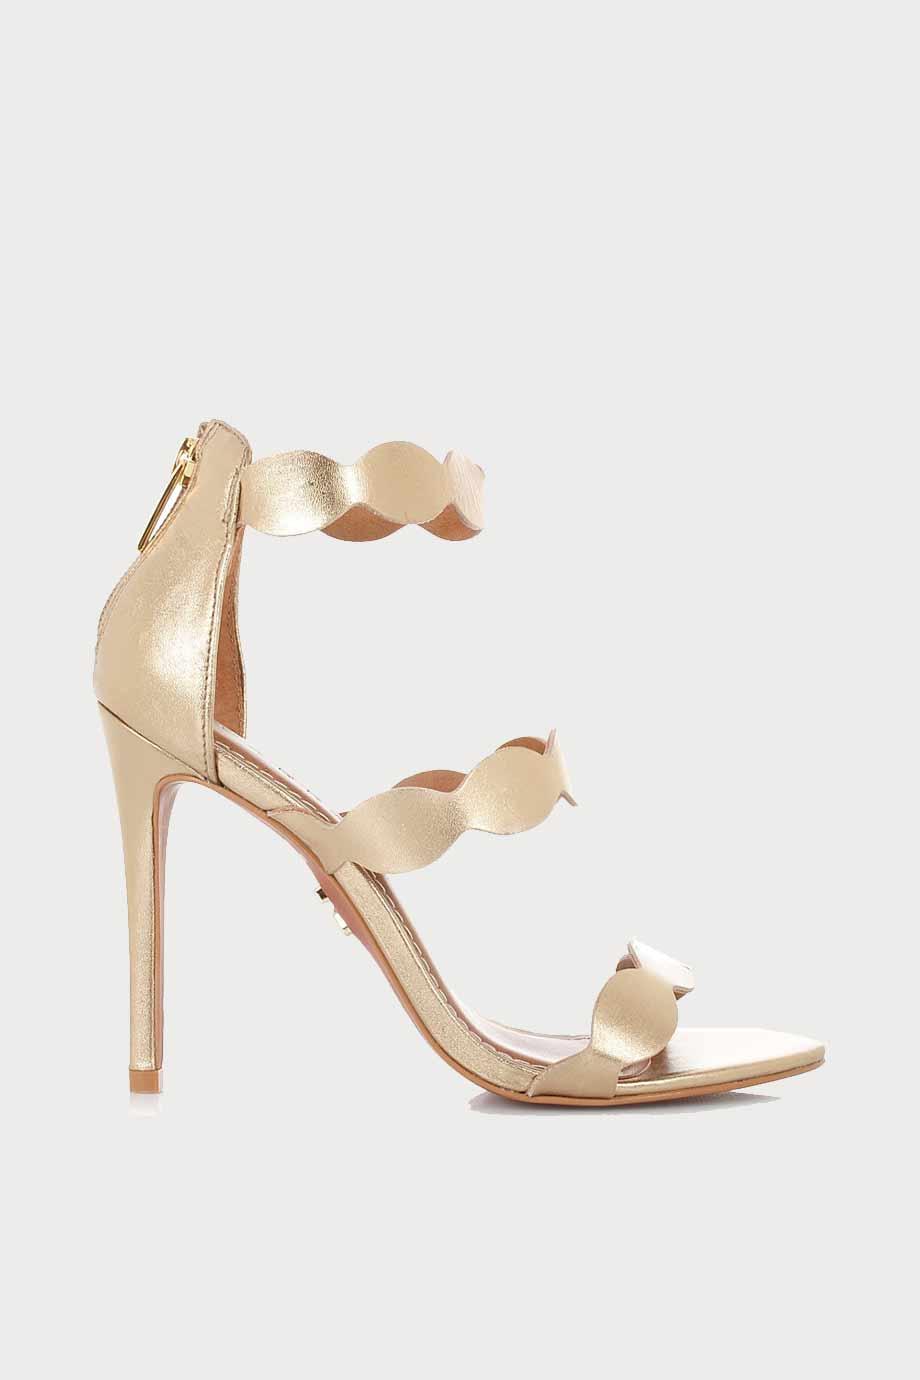 spiridoula metheniti shoes xalkida p Carrano 136642 CAB1 1